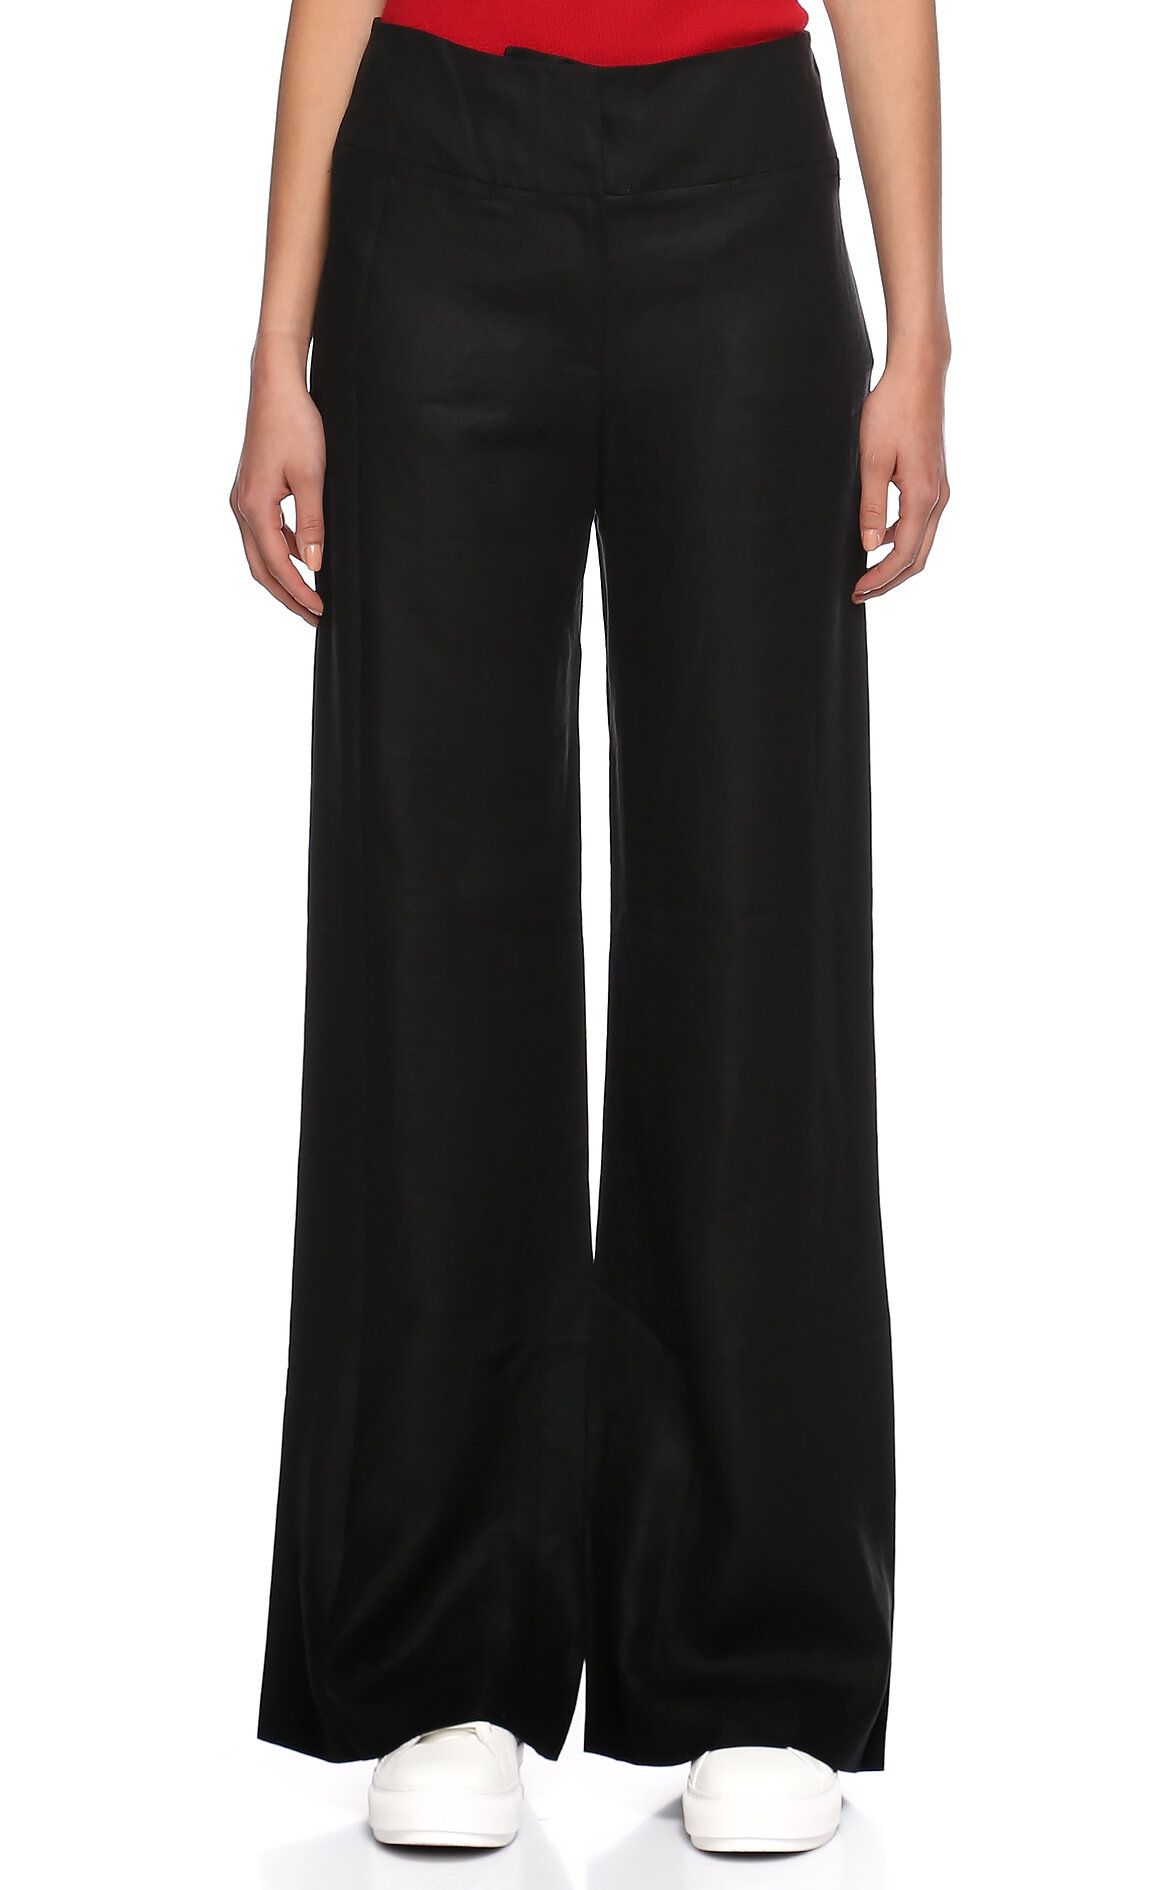 Nicole Farhi-Nicole Farhi Siyah Pantolon